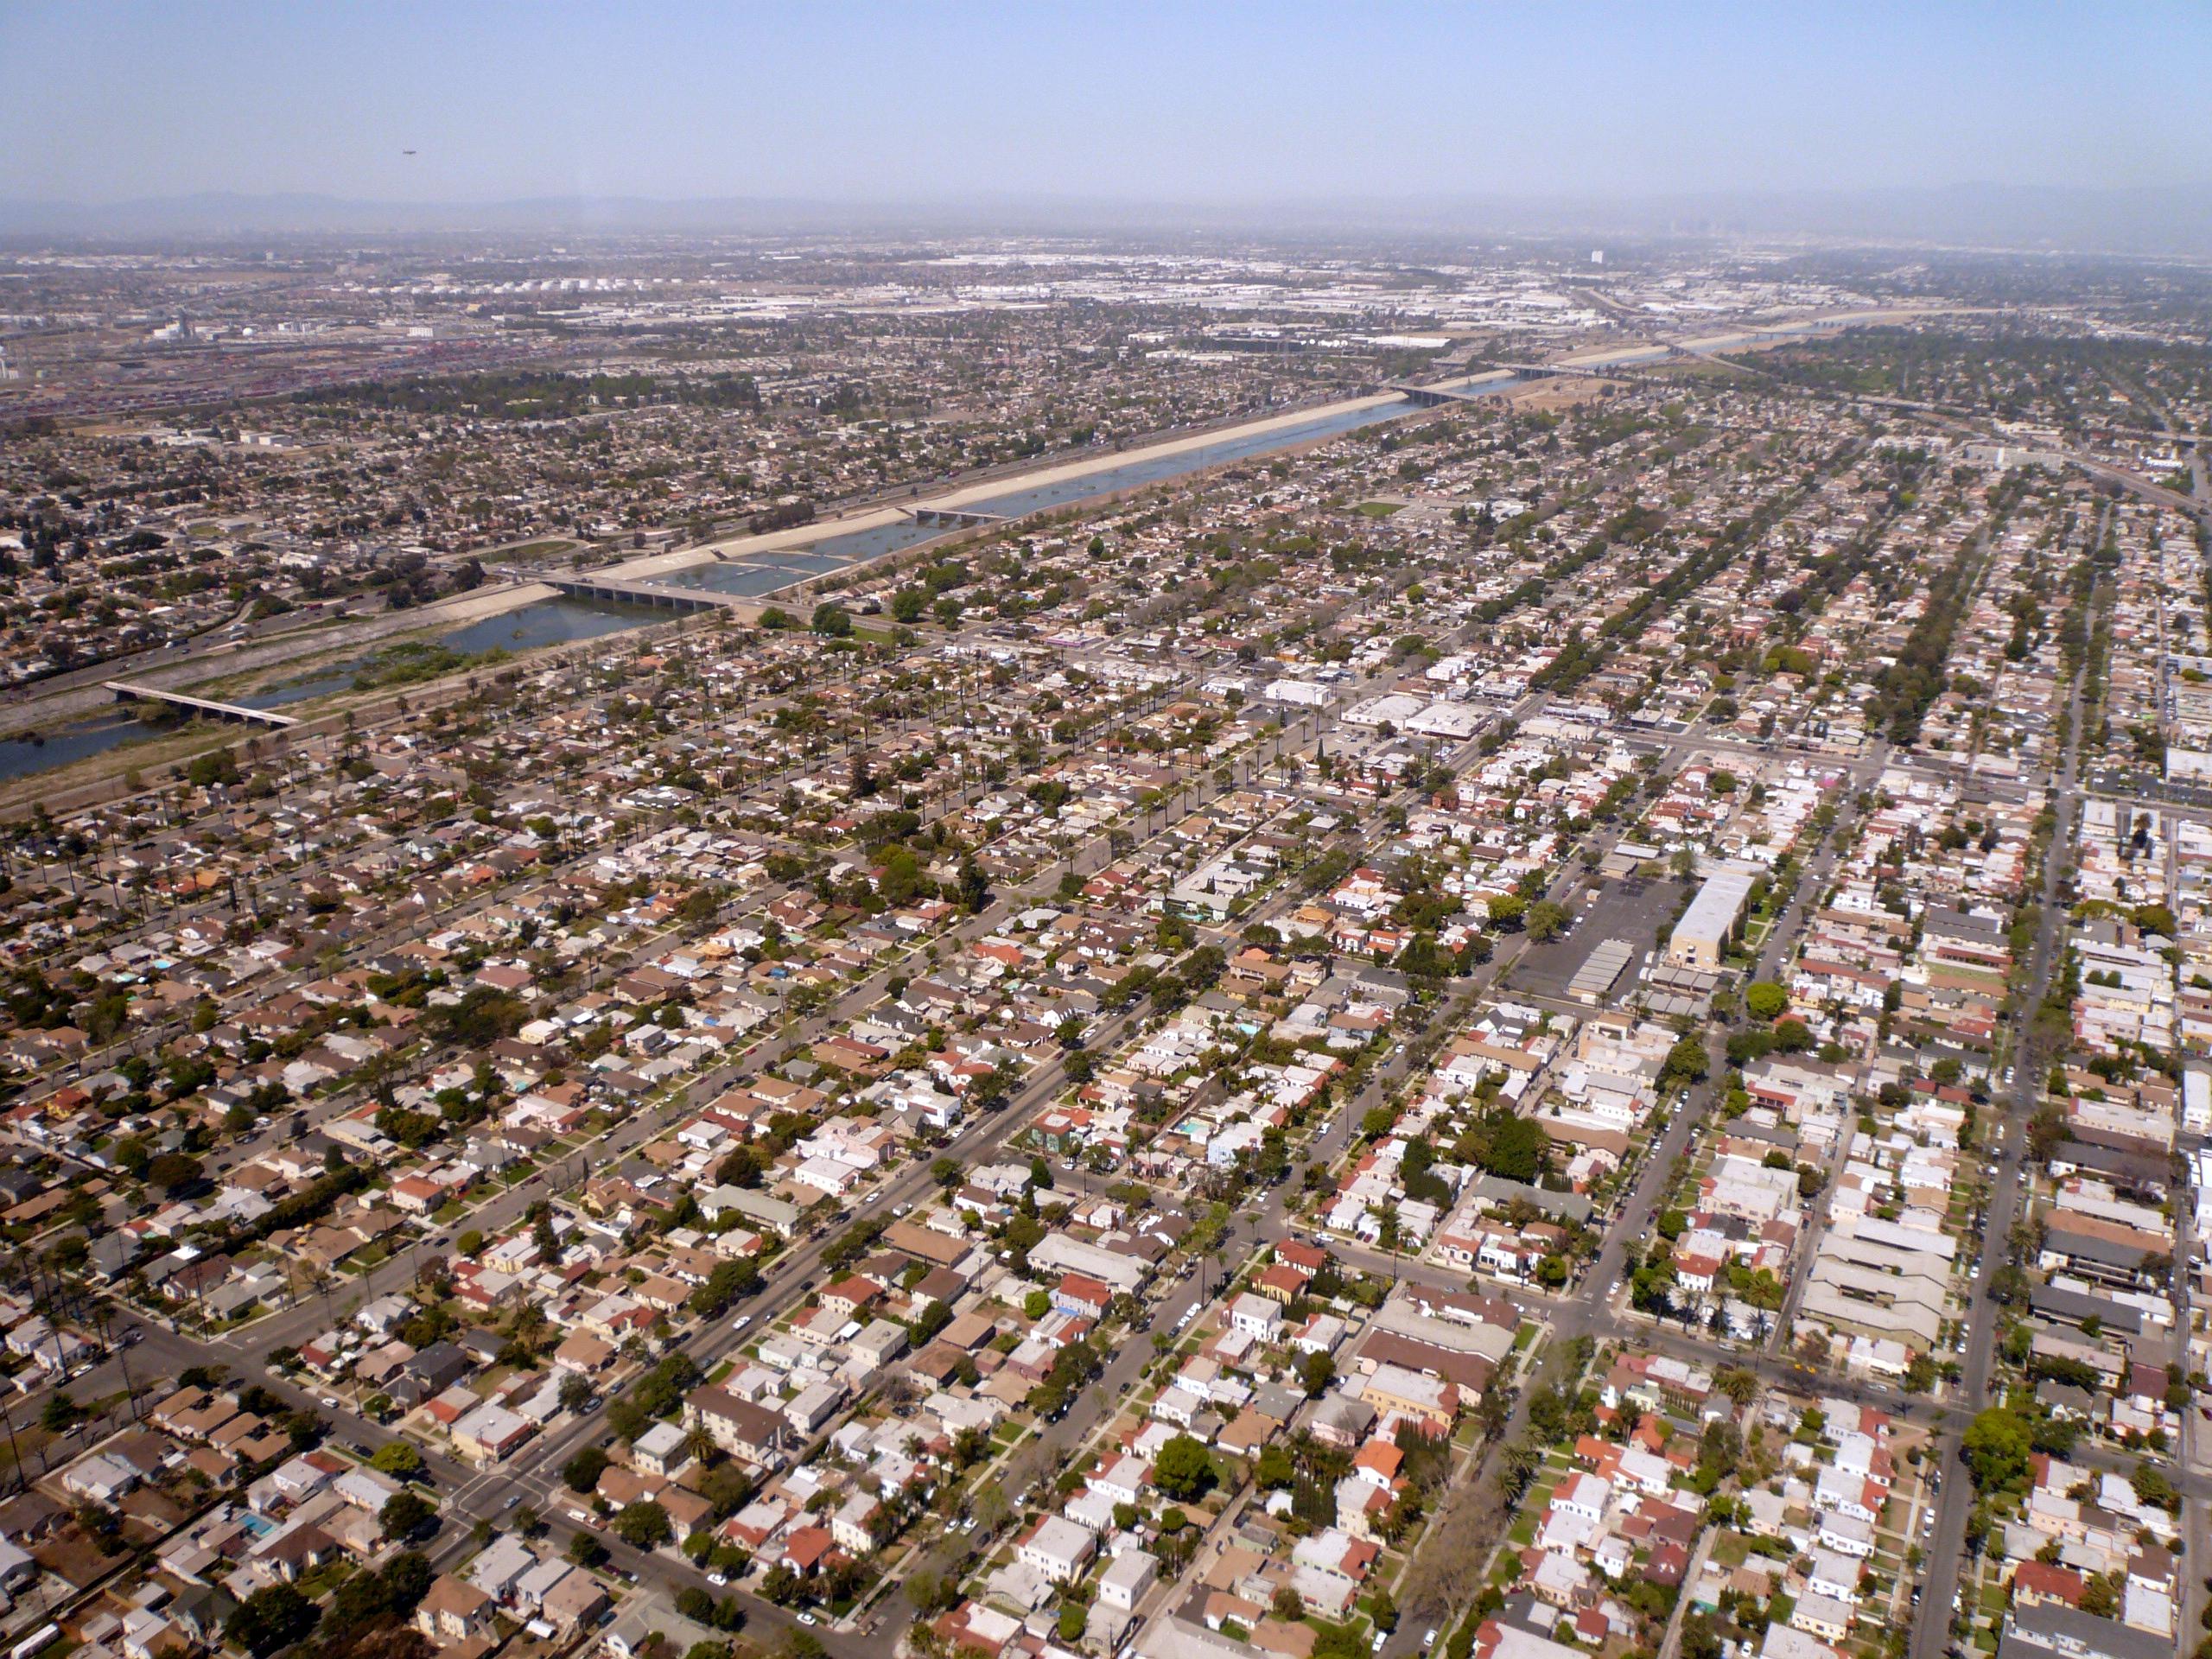 Wrigley Neighborhood, Long Beach, California - Wikipedia